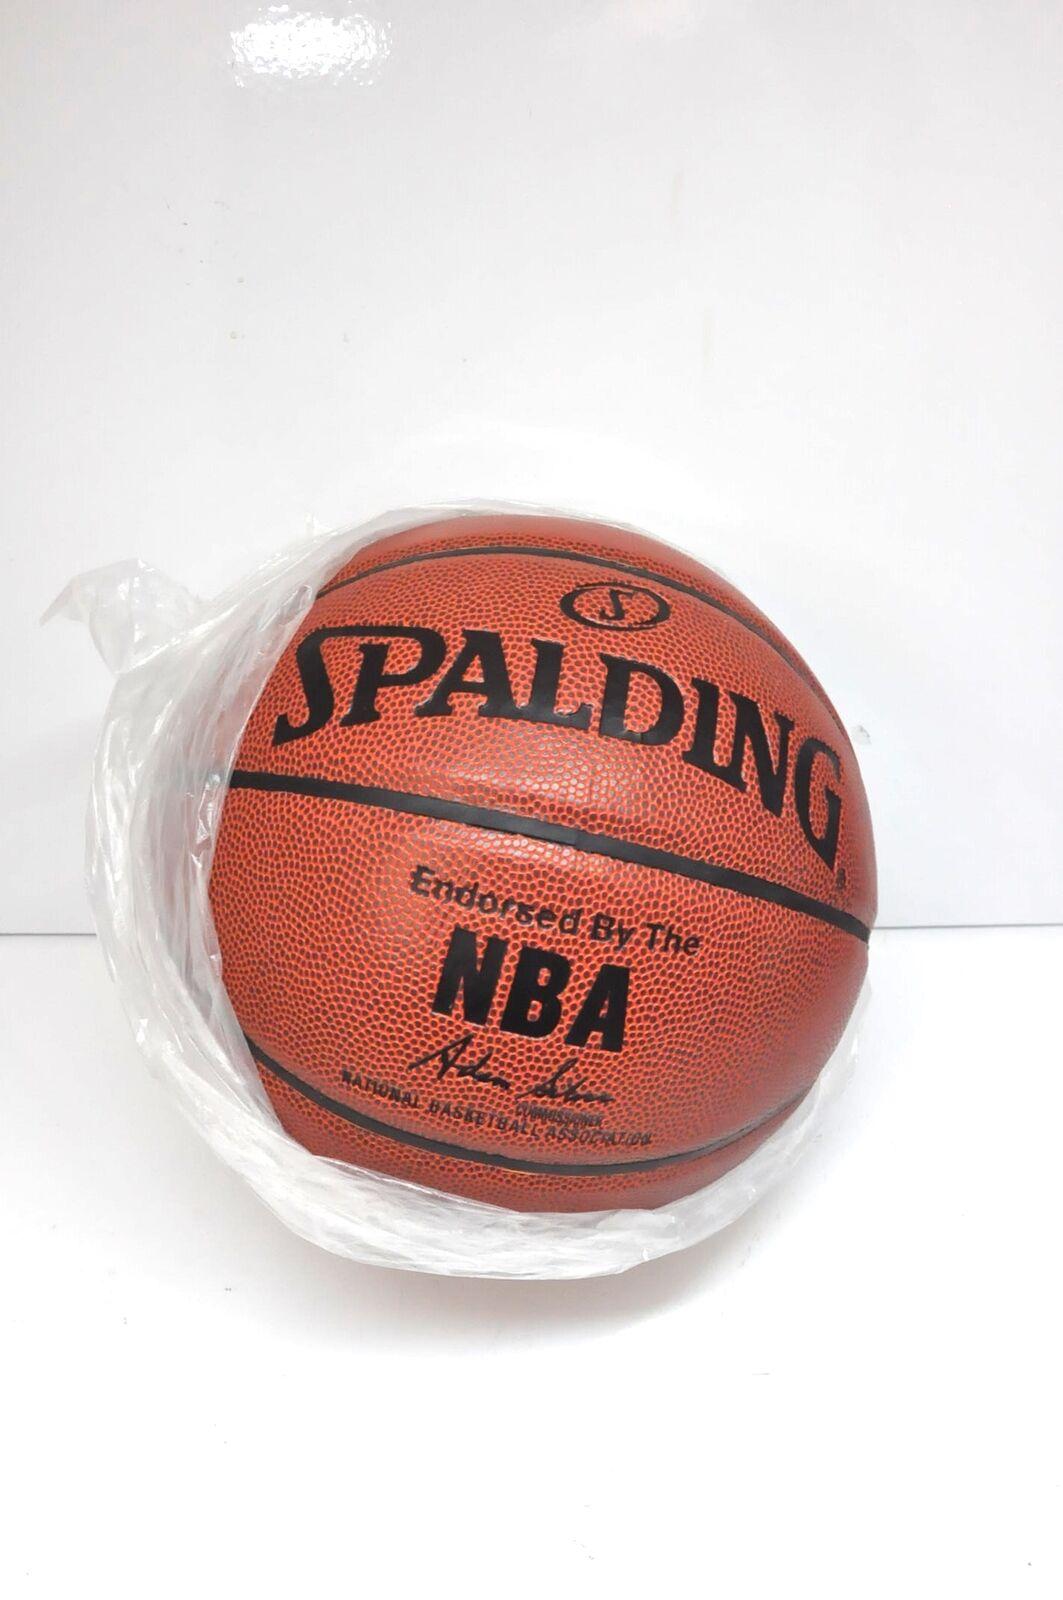 Spalding Basketball NBA Grip Control Indoor Outdoor Outdoor Outdoor Ball Training Sport 0a3150